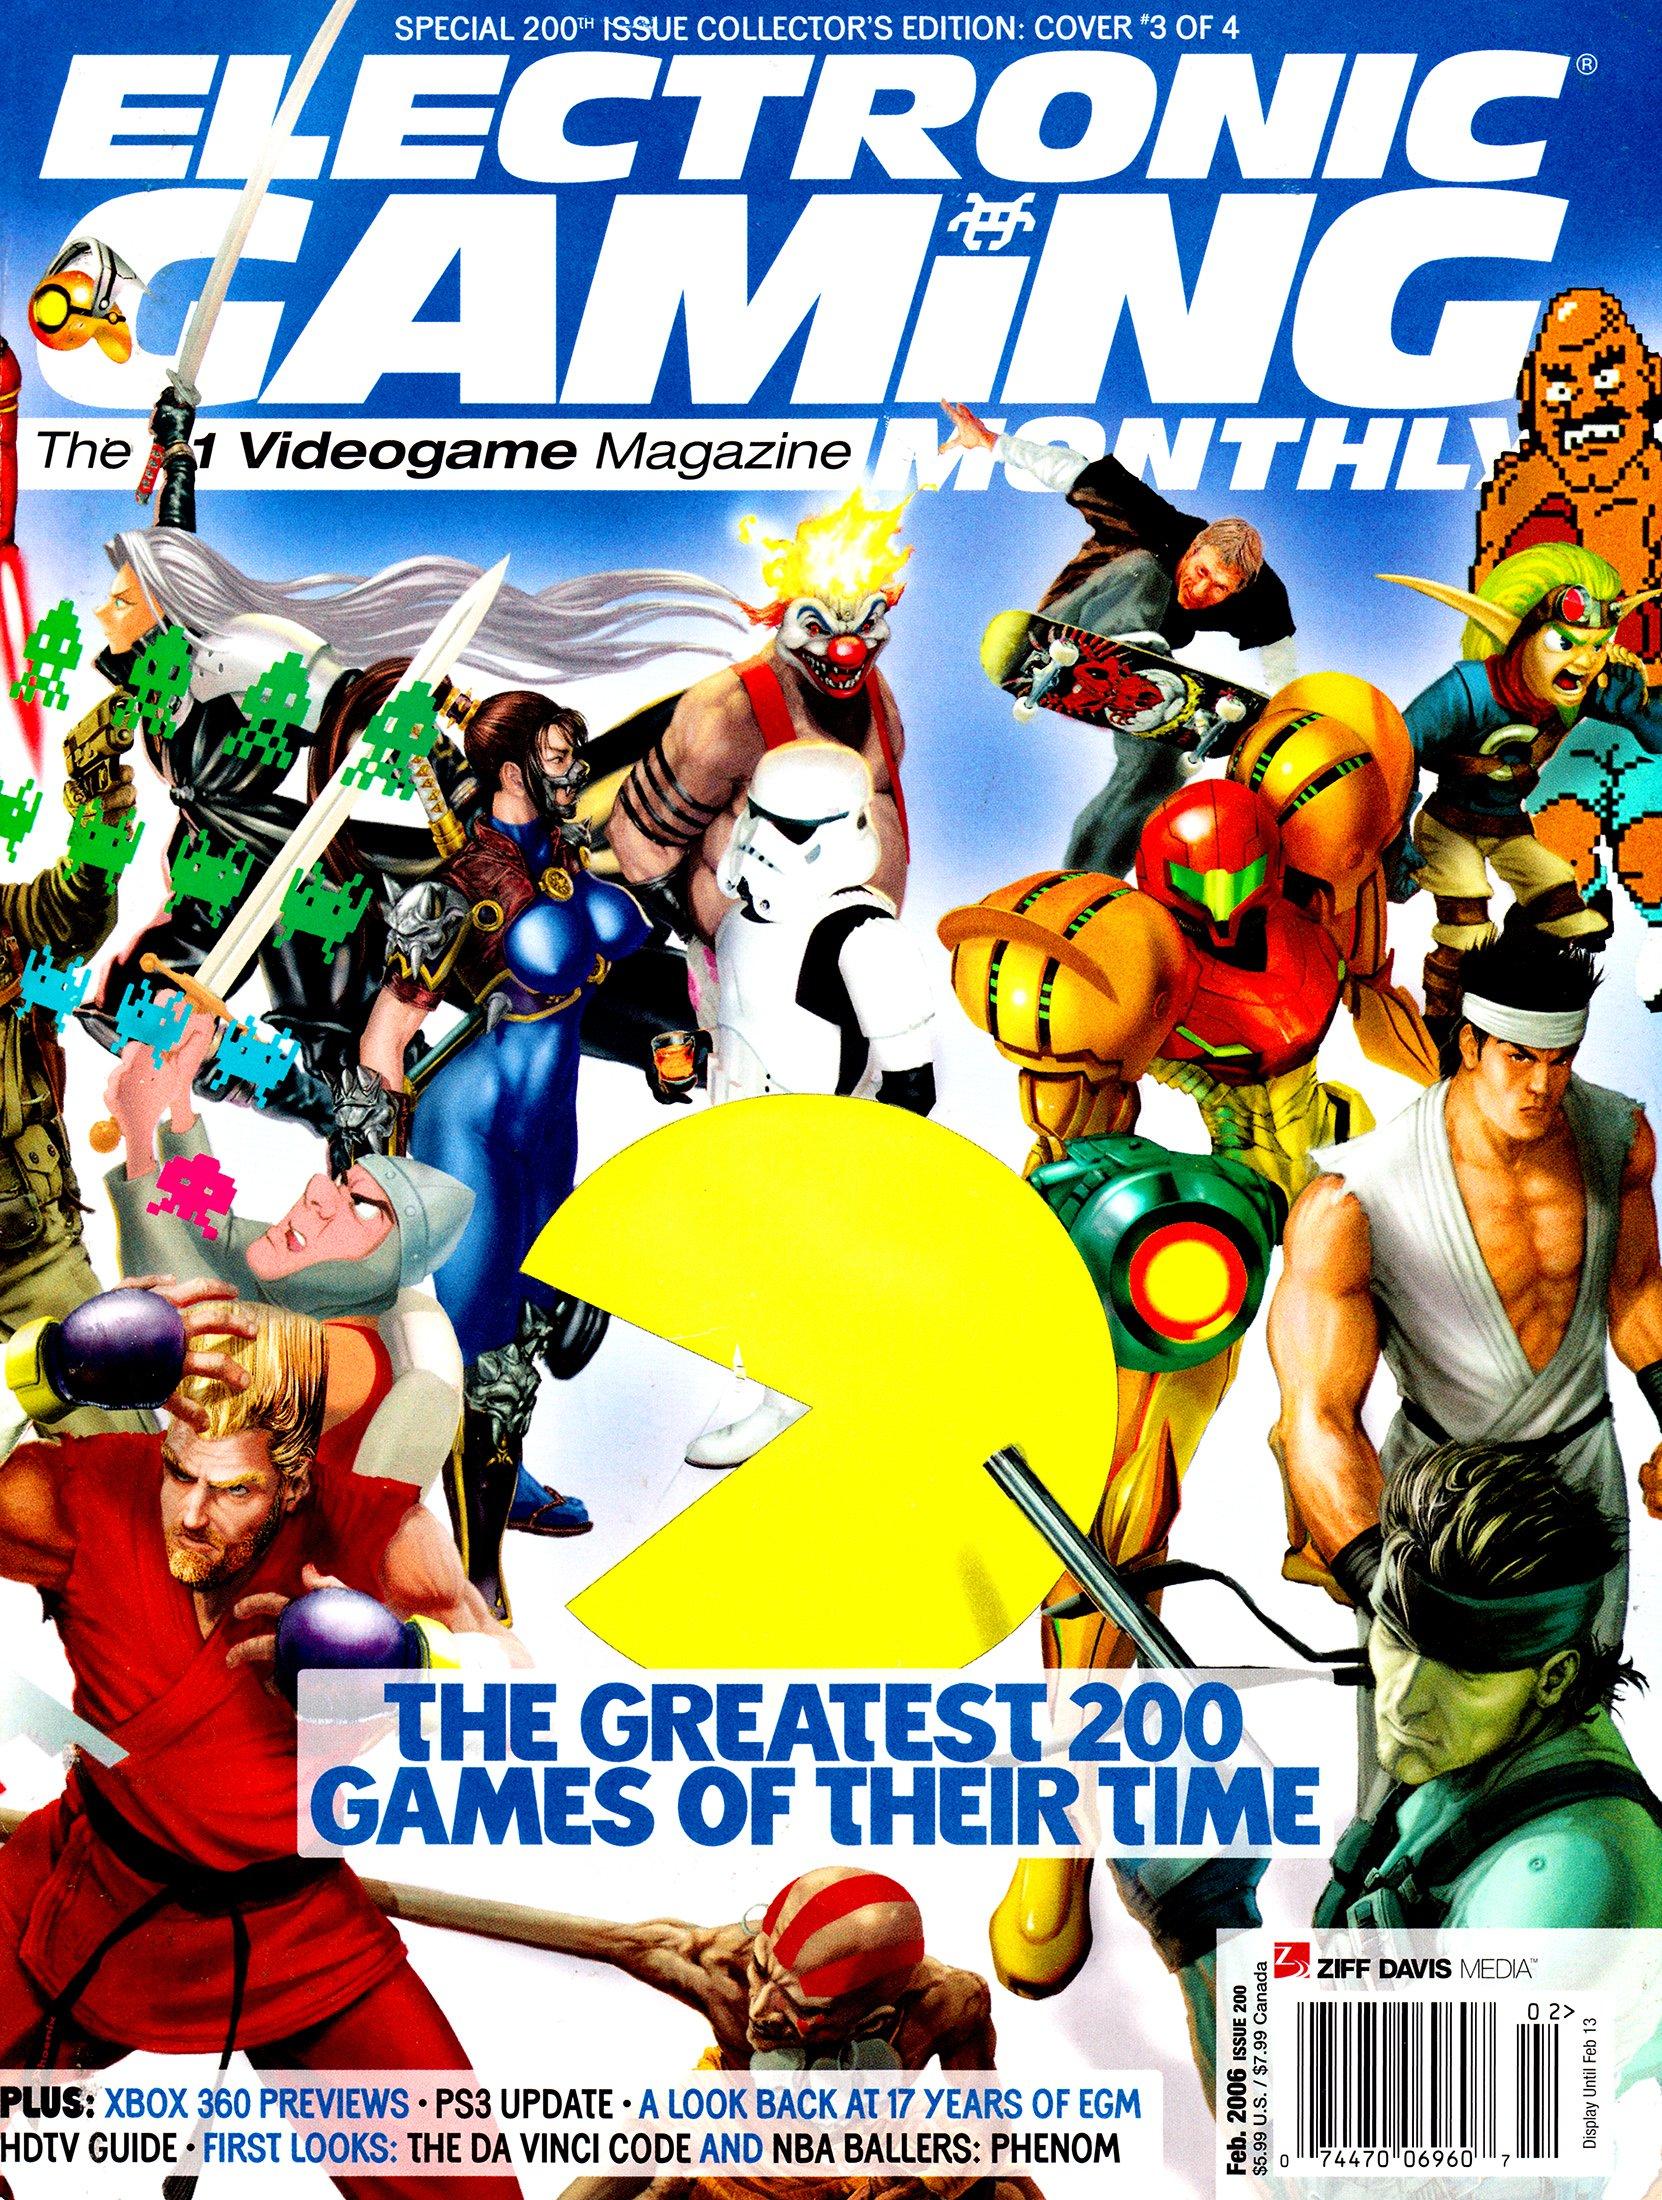 EGM 200 Feb 2006 cover 3